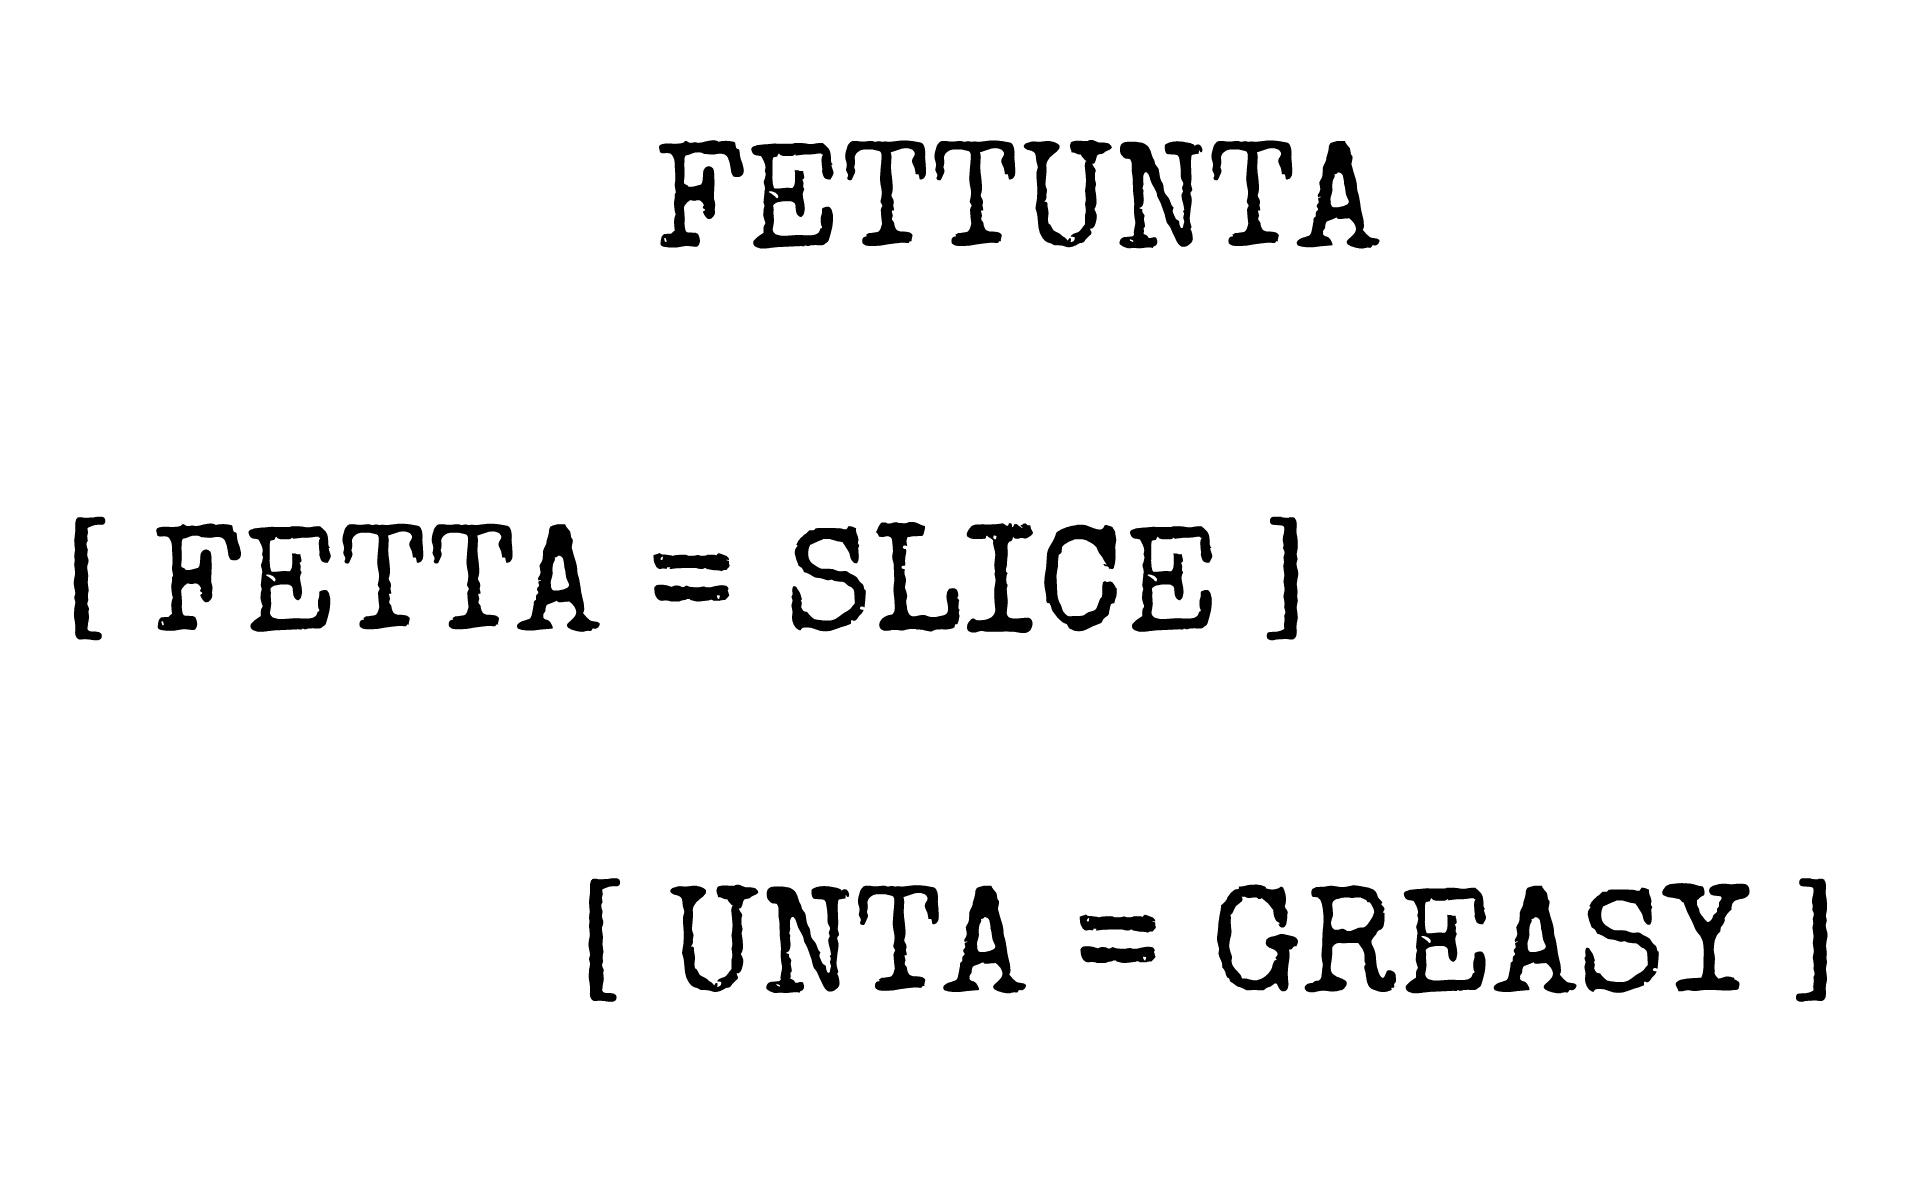 FETTUNTA GREASY SLICE